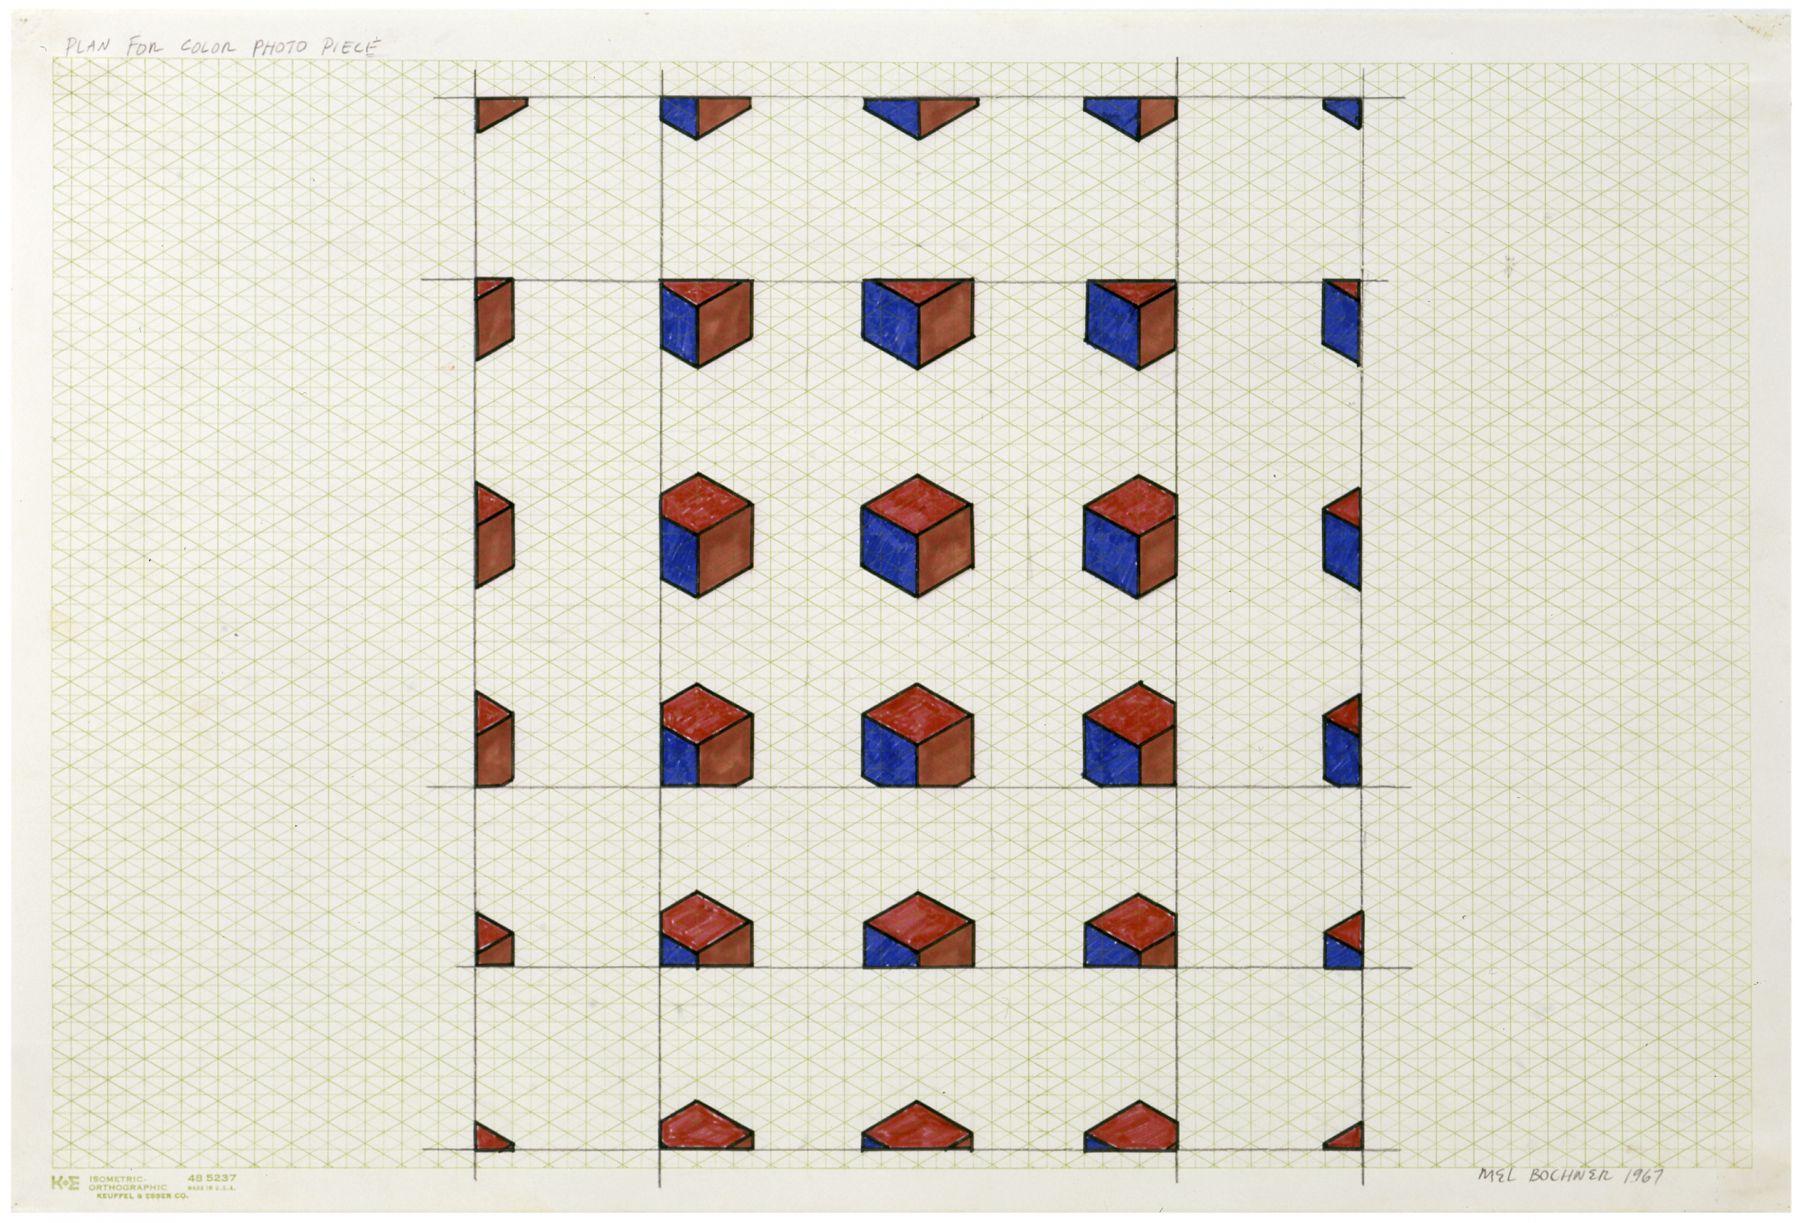 Mel Bochner,Plan for Color Photo Piece, 1967.